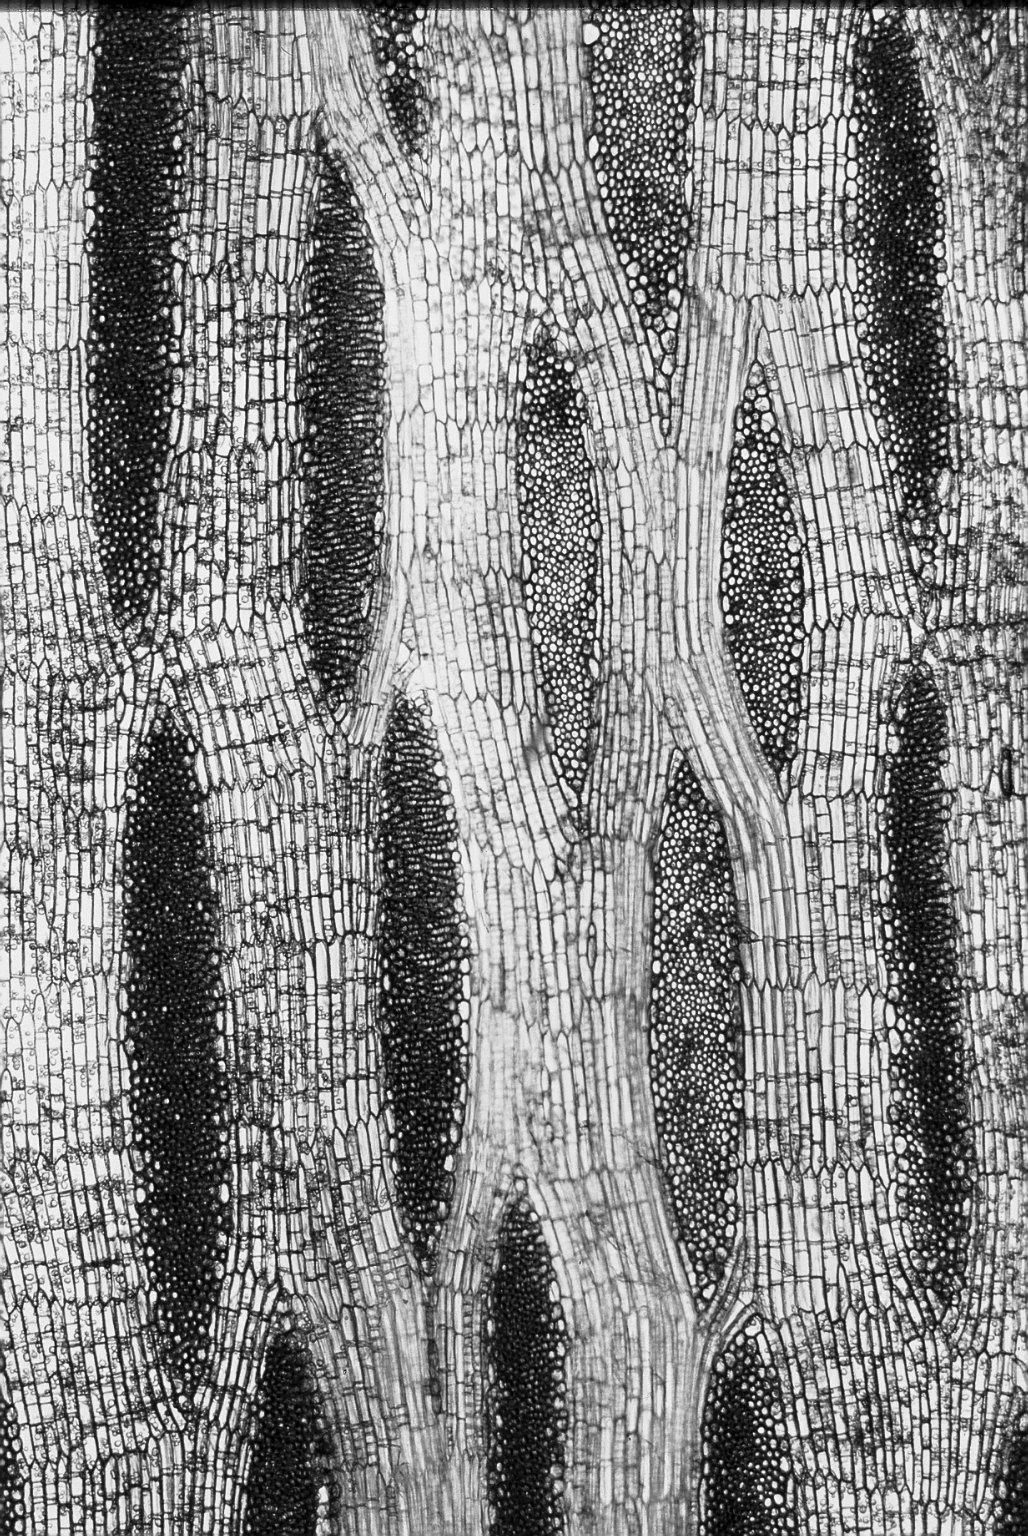 MALVACEAE STERCULIOIDEAE Sterculia oblonga